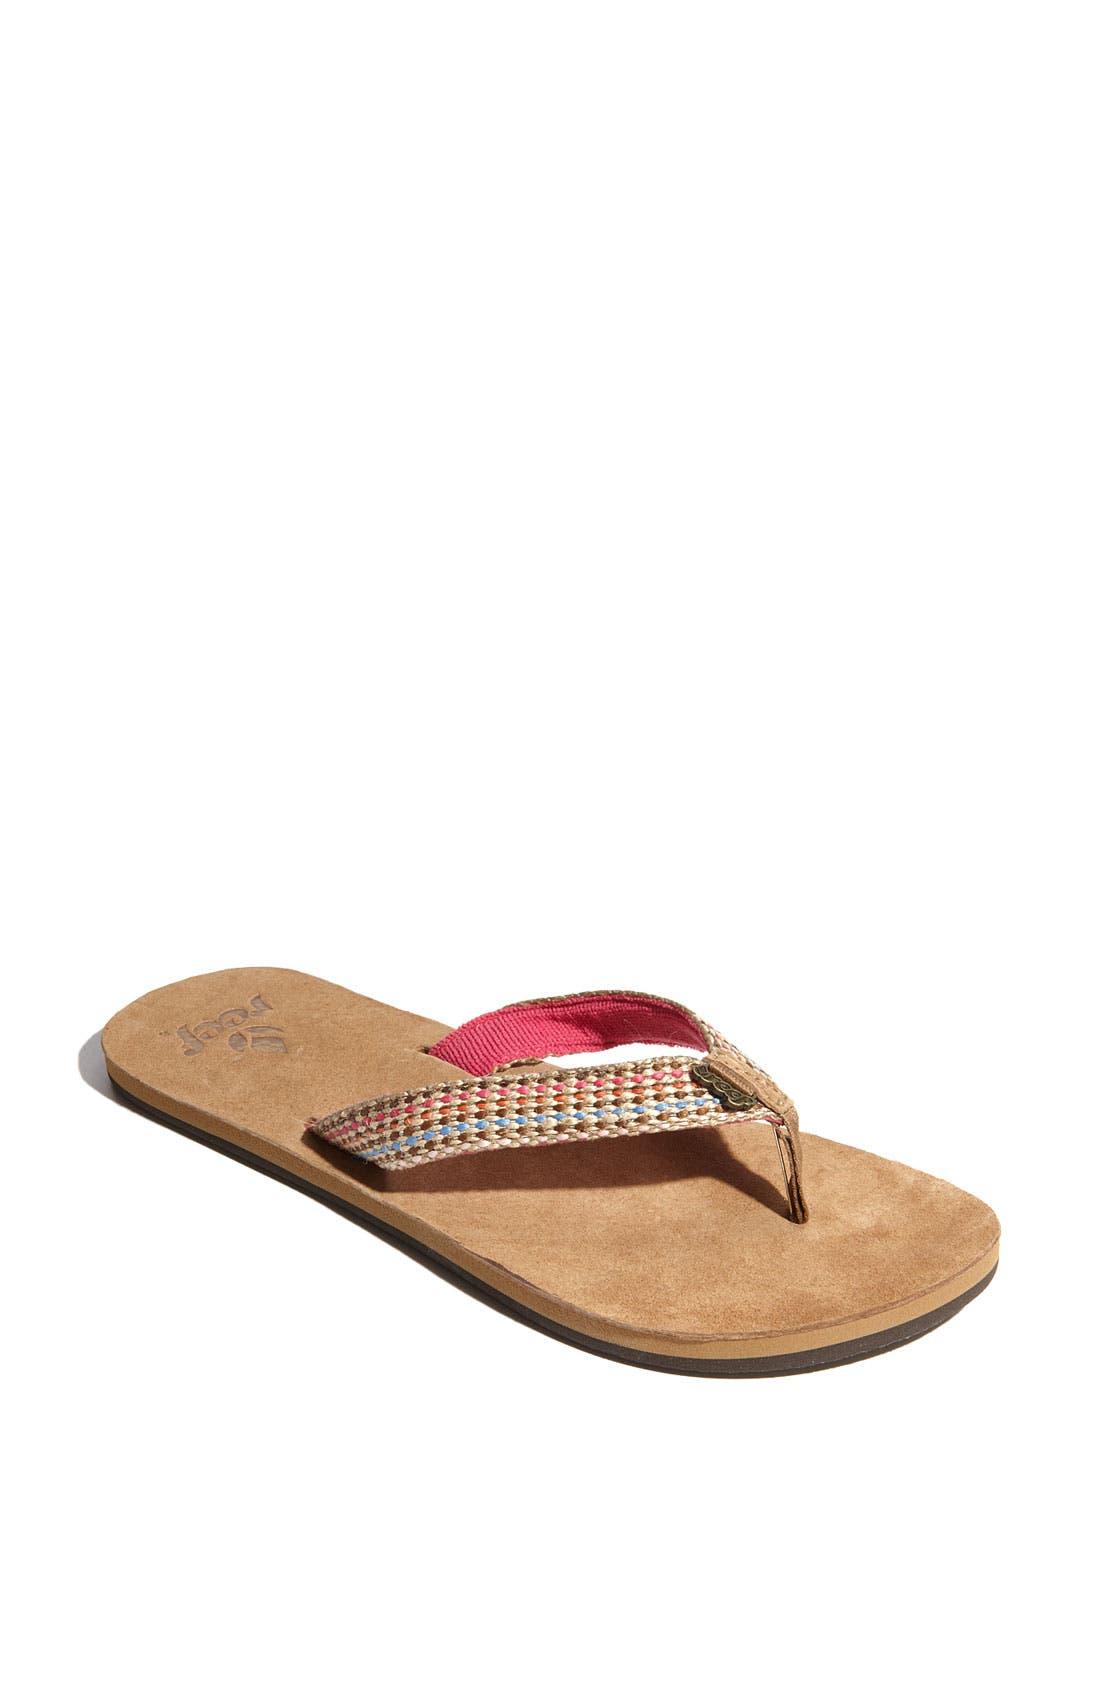 Main Image - Reef 'Gypsylove' Sandal